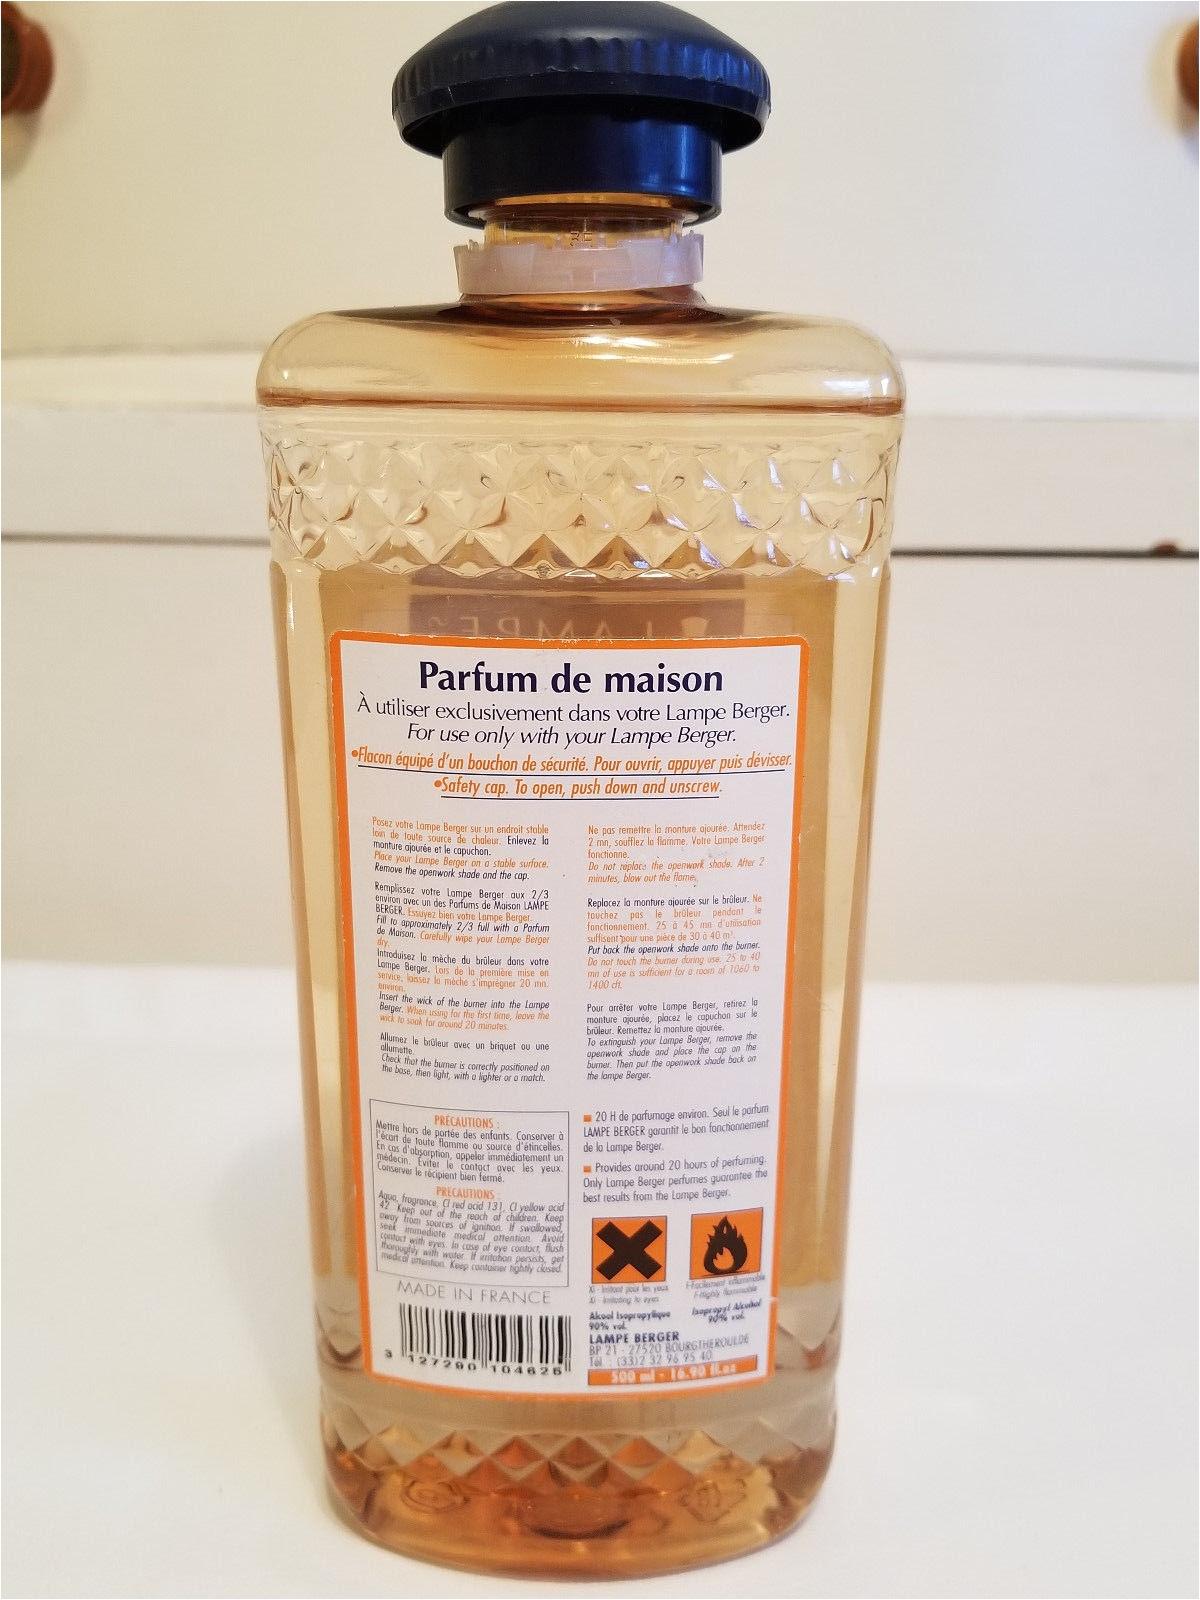 Lampe Berger Wicks Ebay Old Stock Lampe Berger Paris Laurier Rose Parfum De Maison Liquid